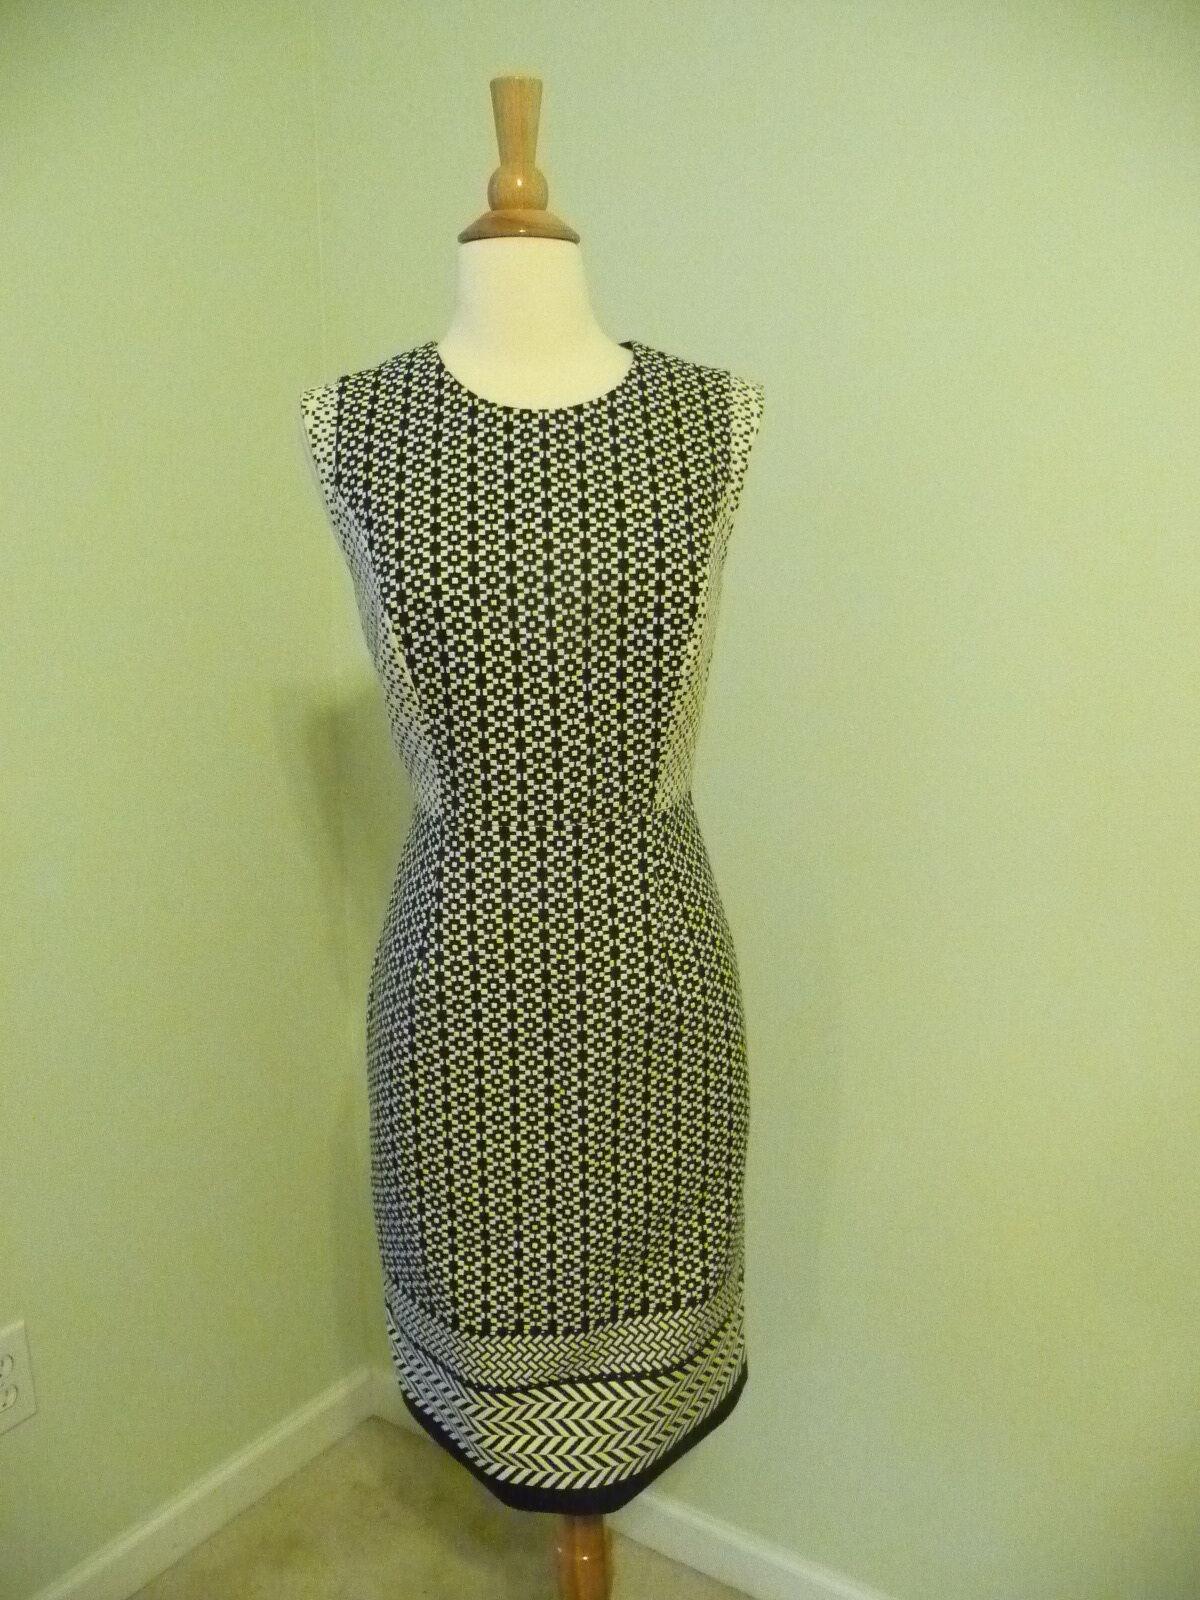 nyA J.CREW PANED GEOMETRIC DRESS, F0075, storLEK 6, VITT MULTI,